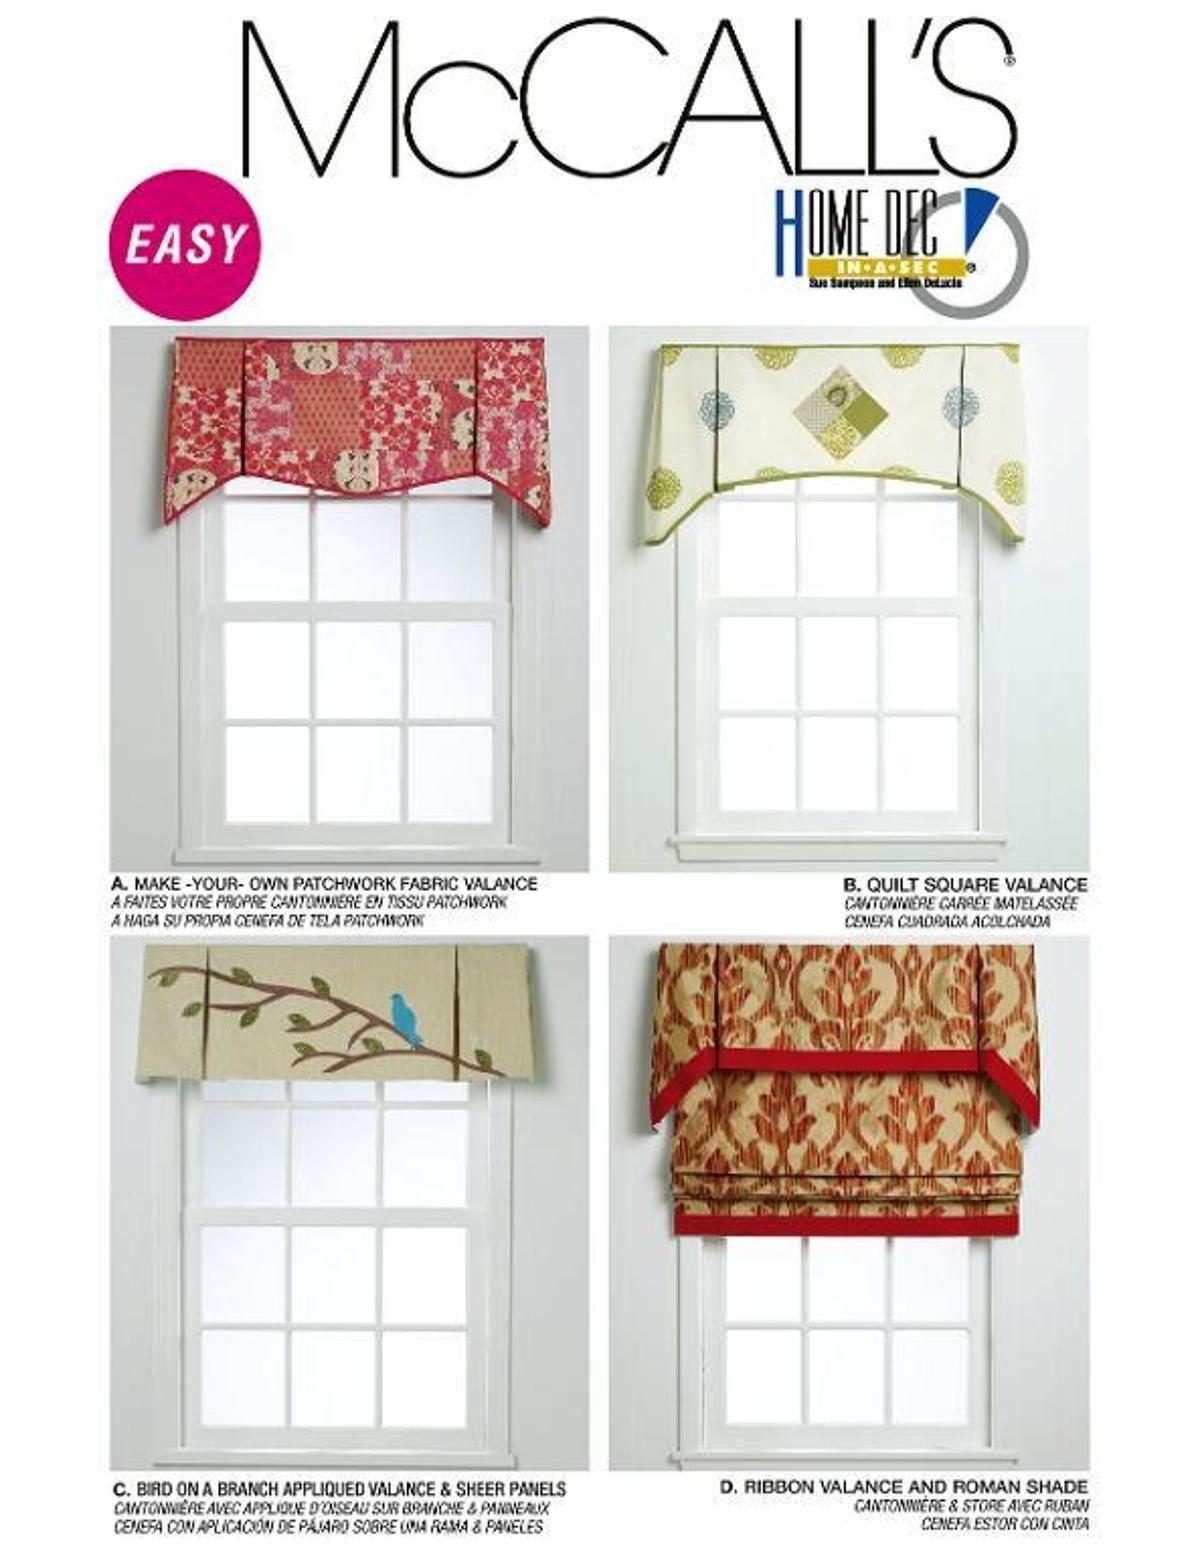 Window Valence Pattern : window, valence, pattern, Sewing, Classes, Craftsy, Valance, Patterns,, Window, Valance,, Curtain, Patterns